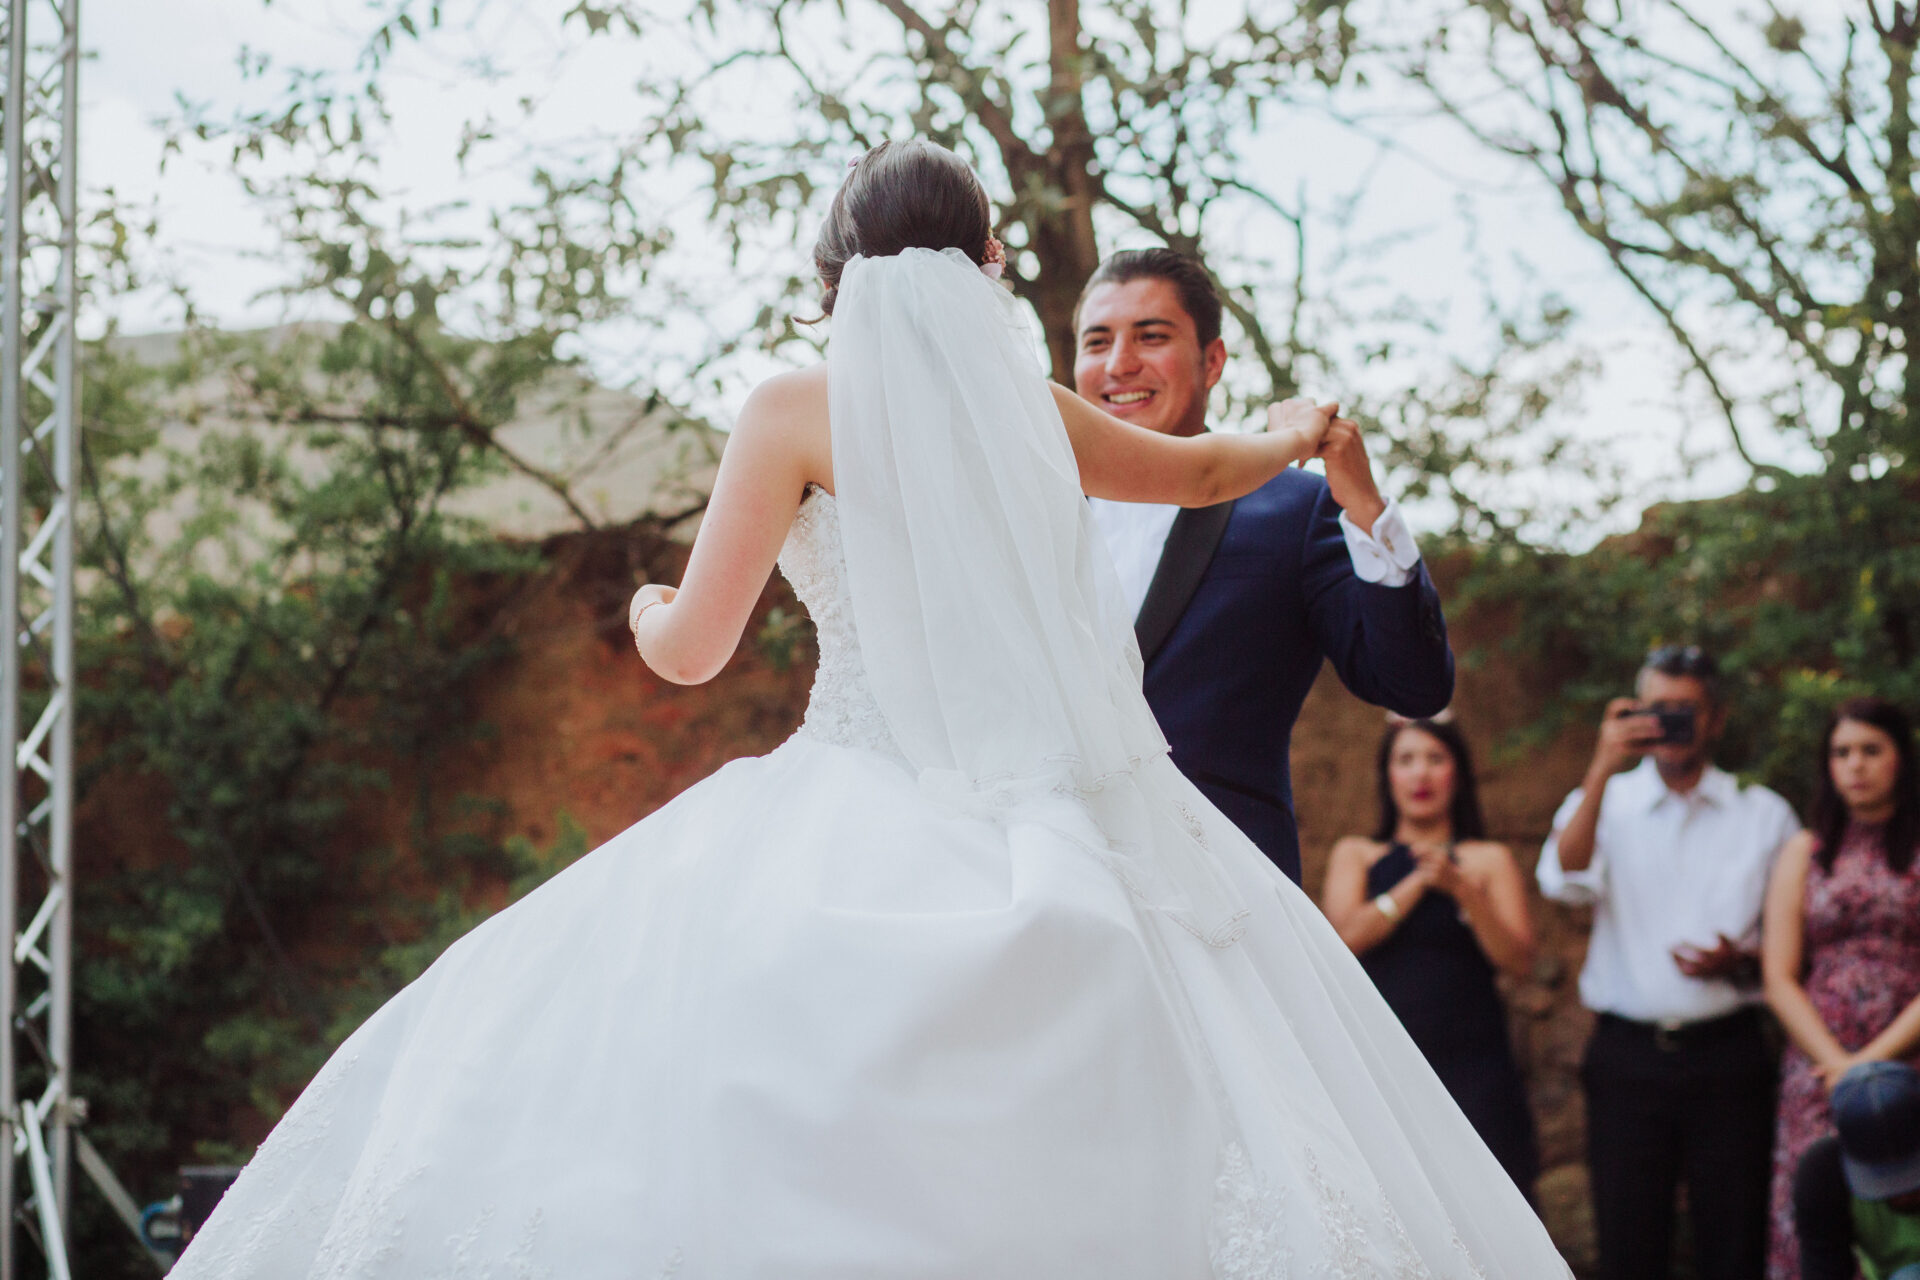 javier_noriega_fotografo_bodas_exhacienda_las_mercedes_zacatecas_wedding_photographer14a